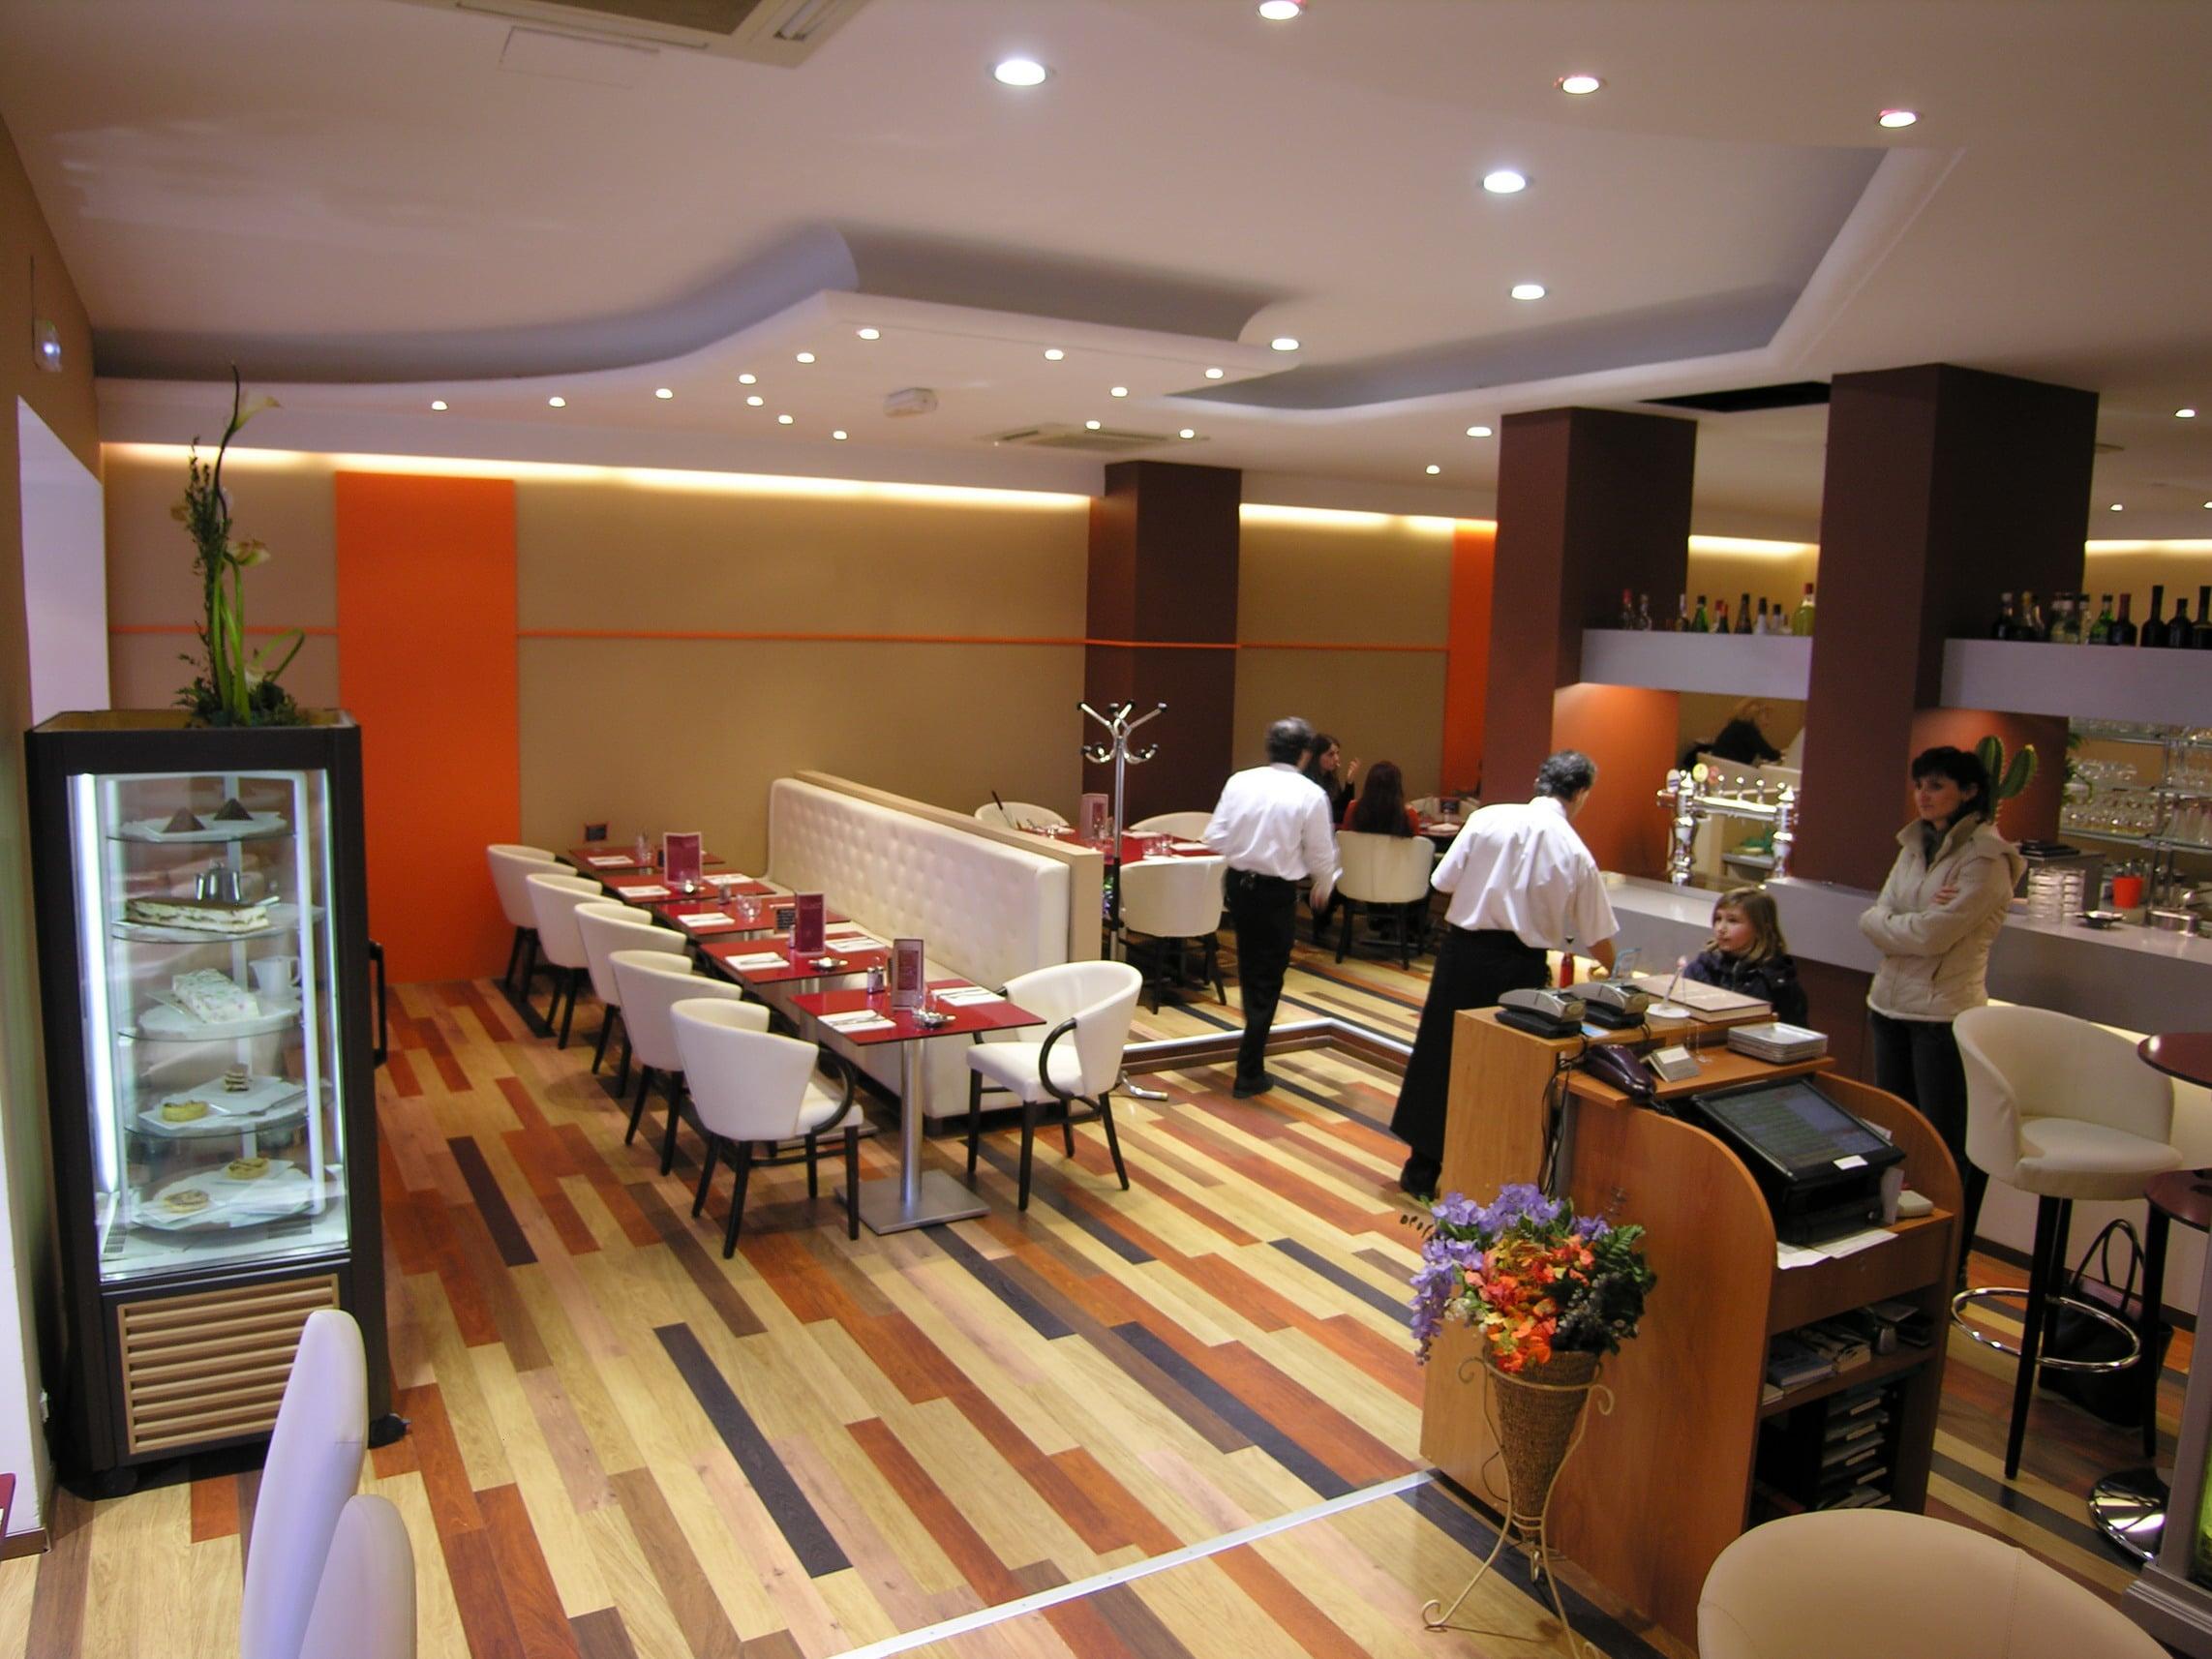 Deco restaurant design modern concept design of restaurant